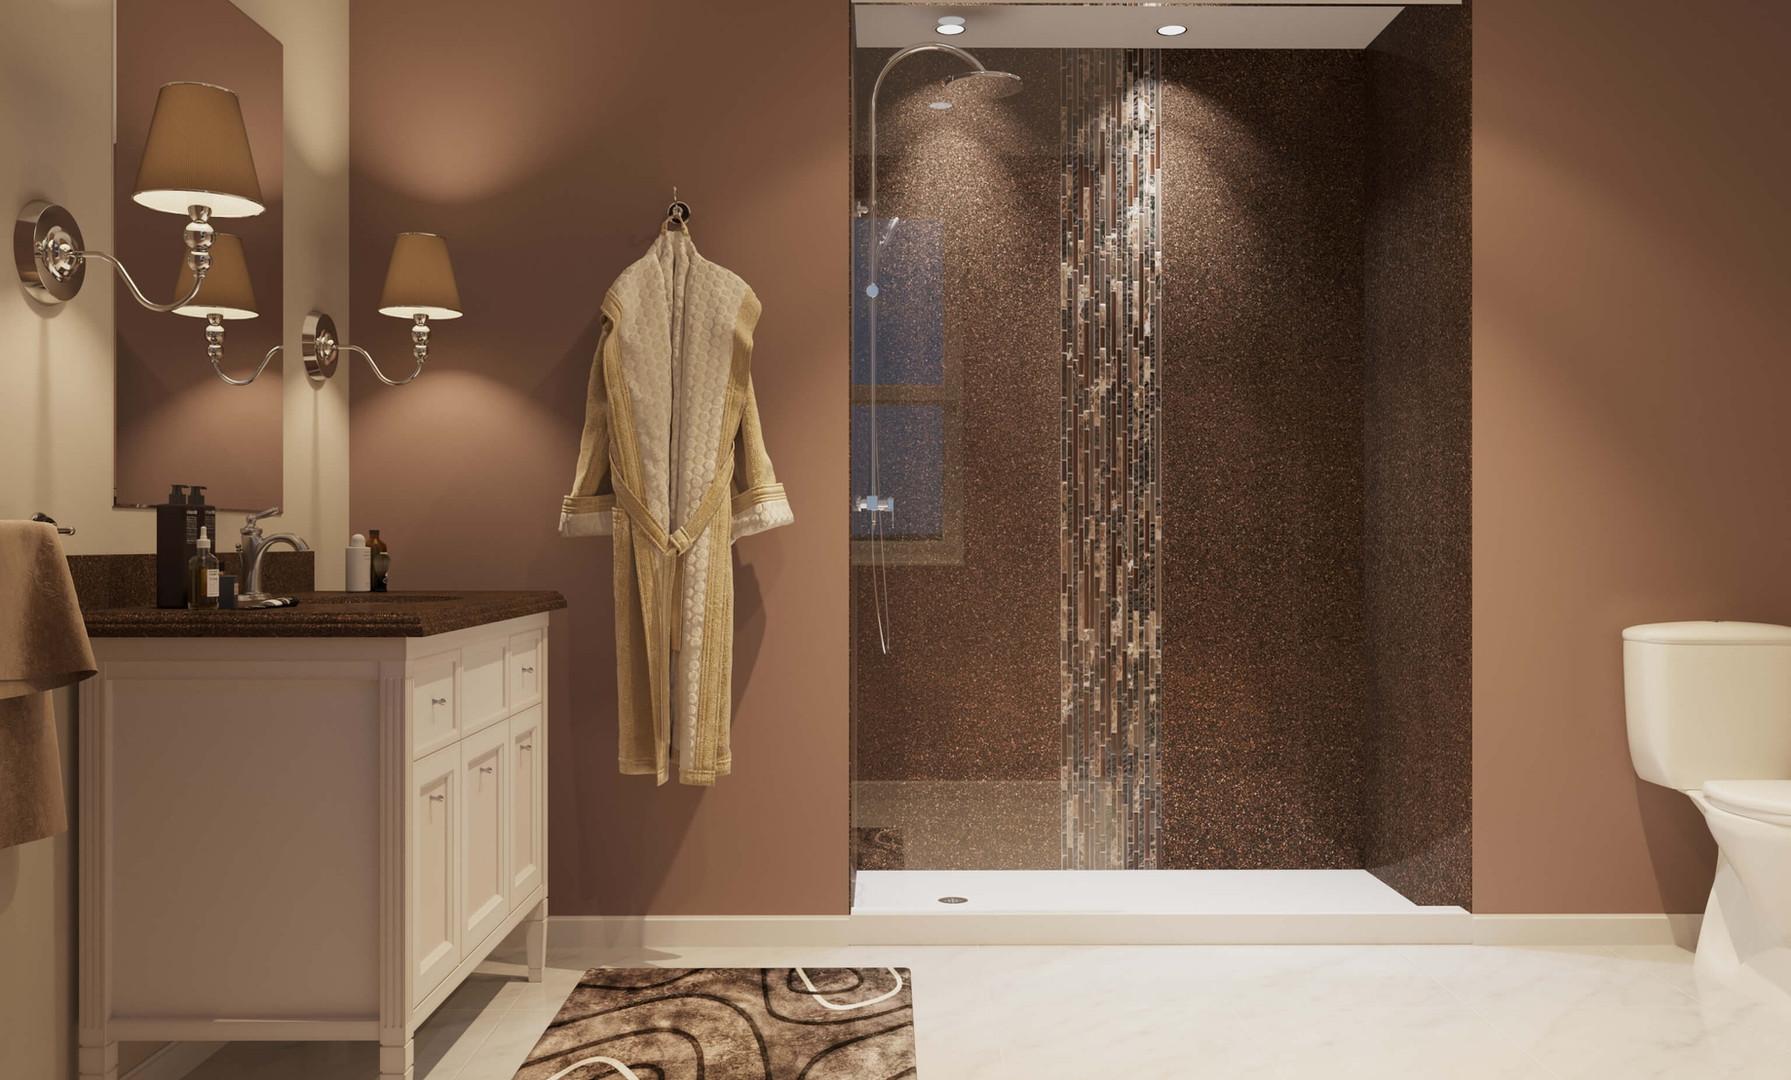 Bathroom_8_5_high res.jpg